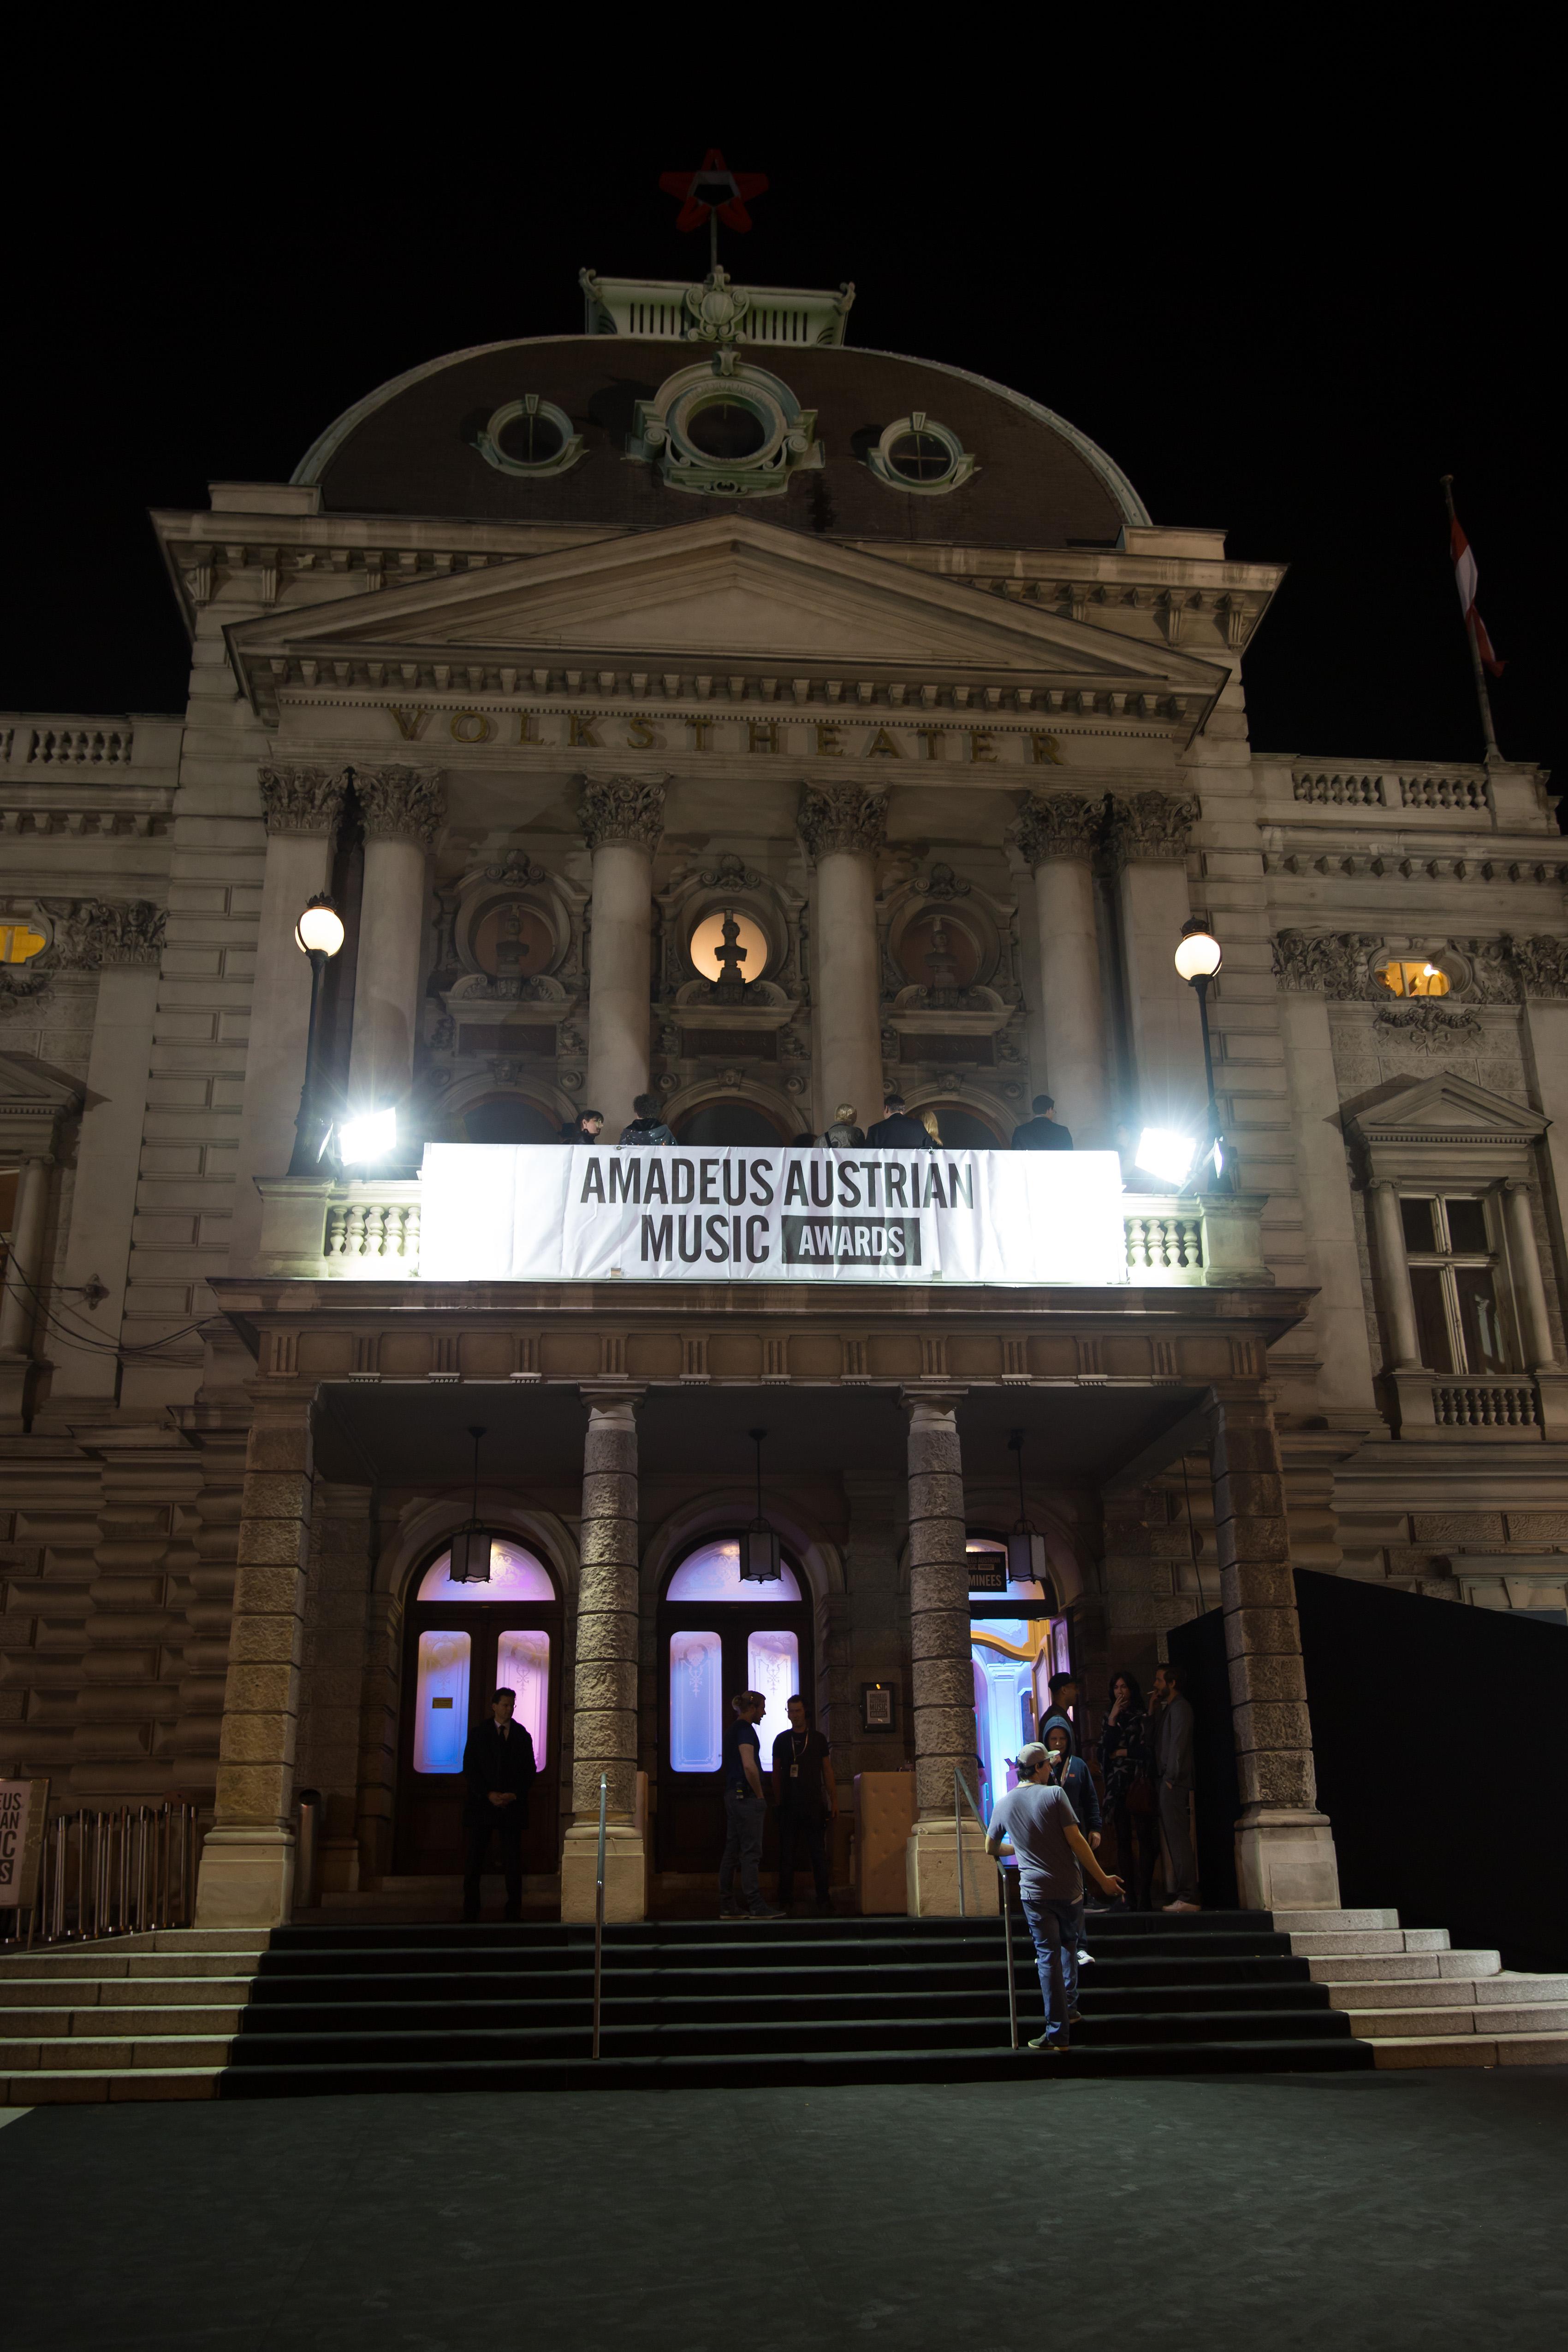 Amadeus Austrian Music Awards 2015 im Wiener Volkstheater